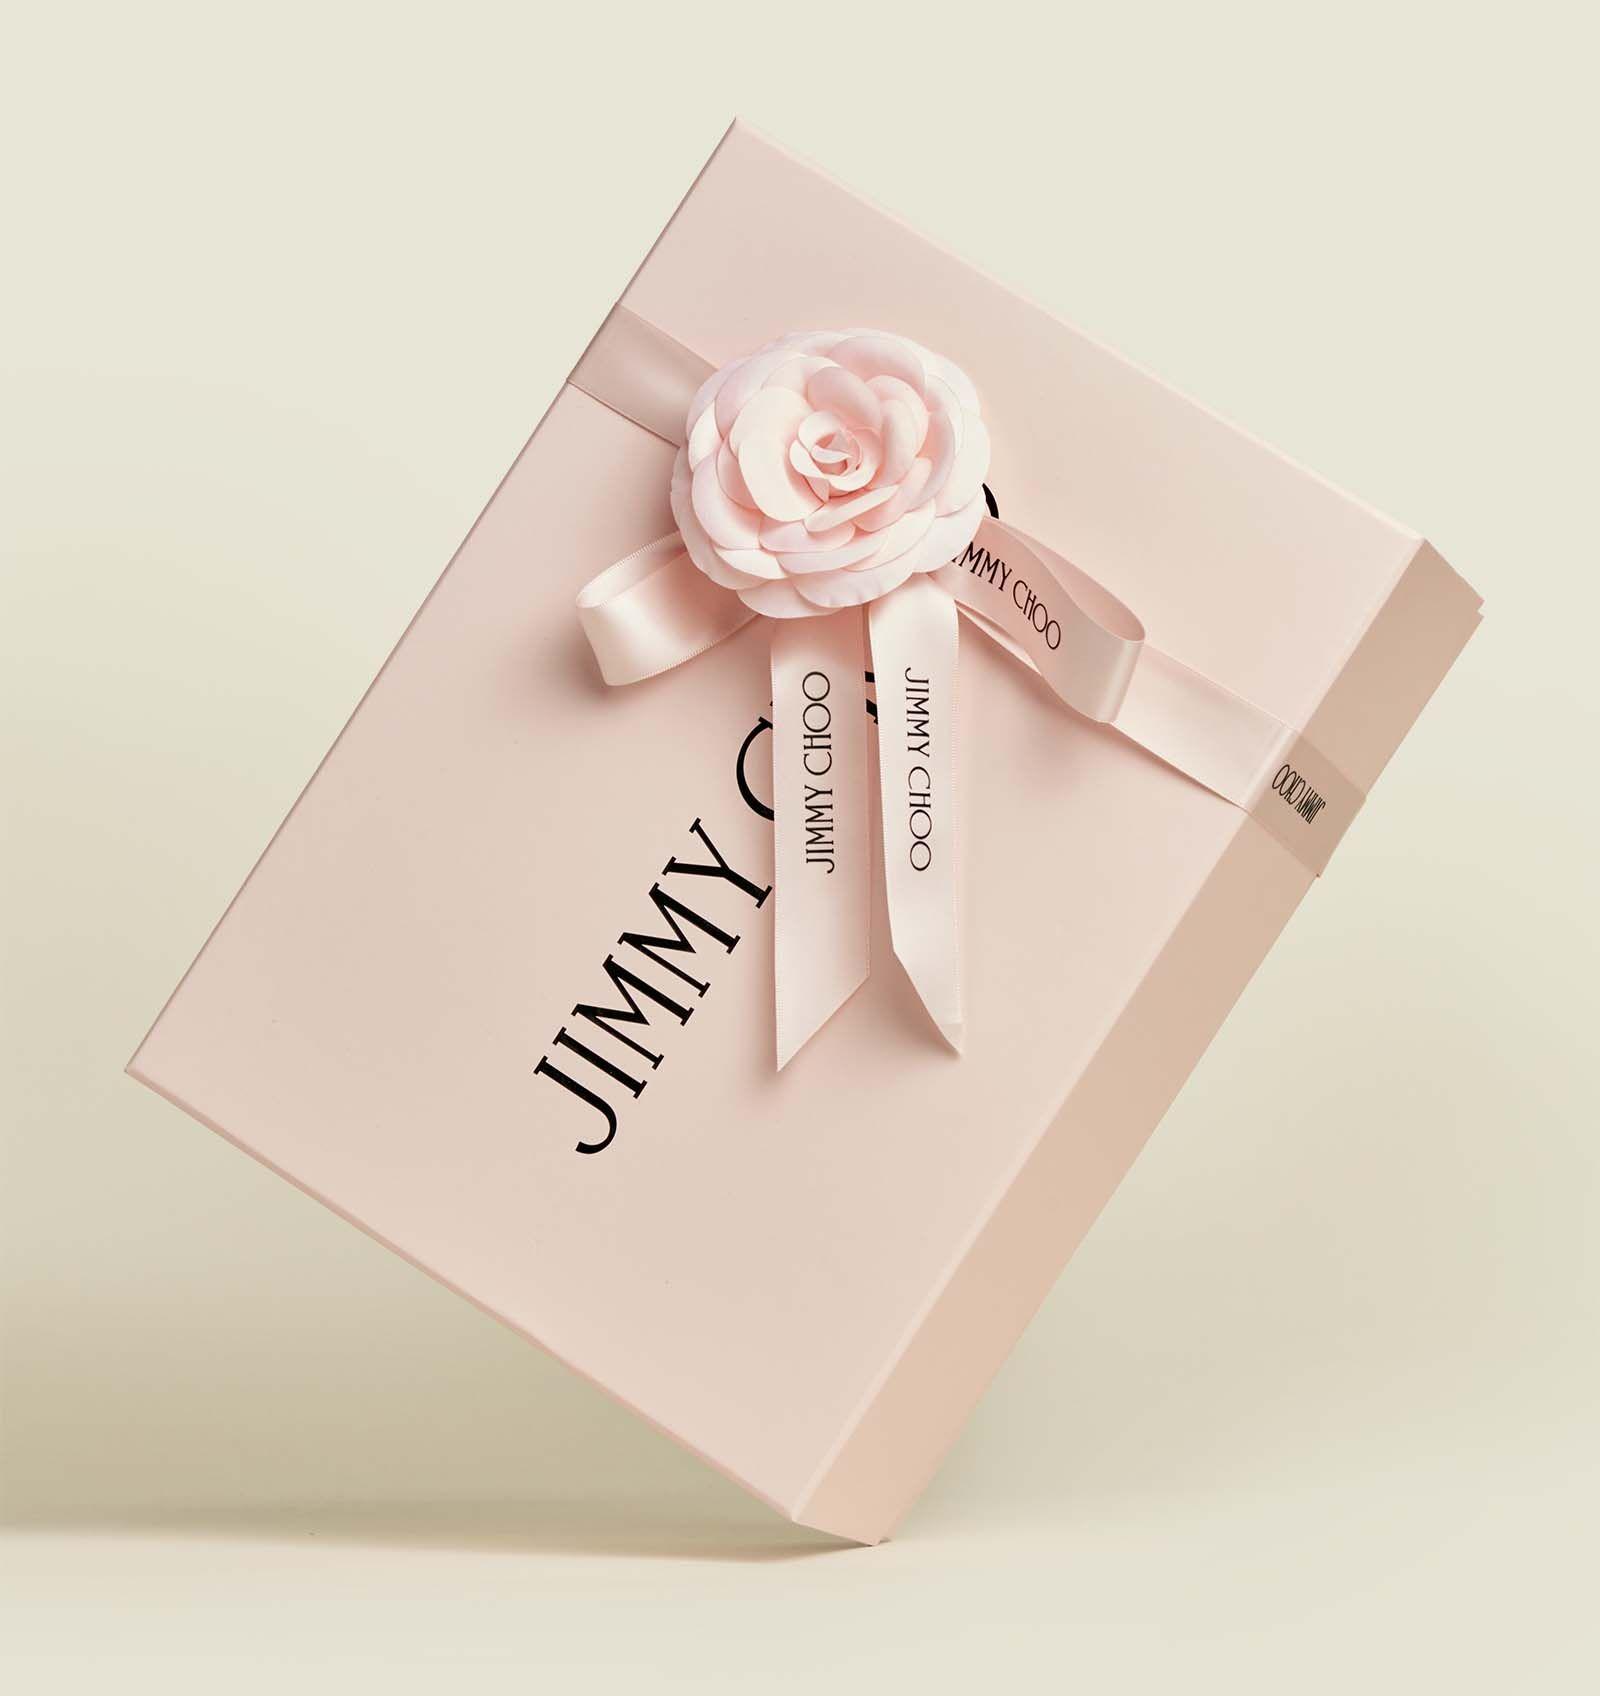 Custom hinged box packaging